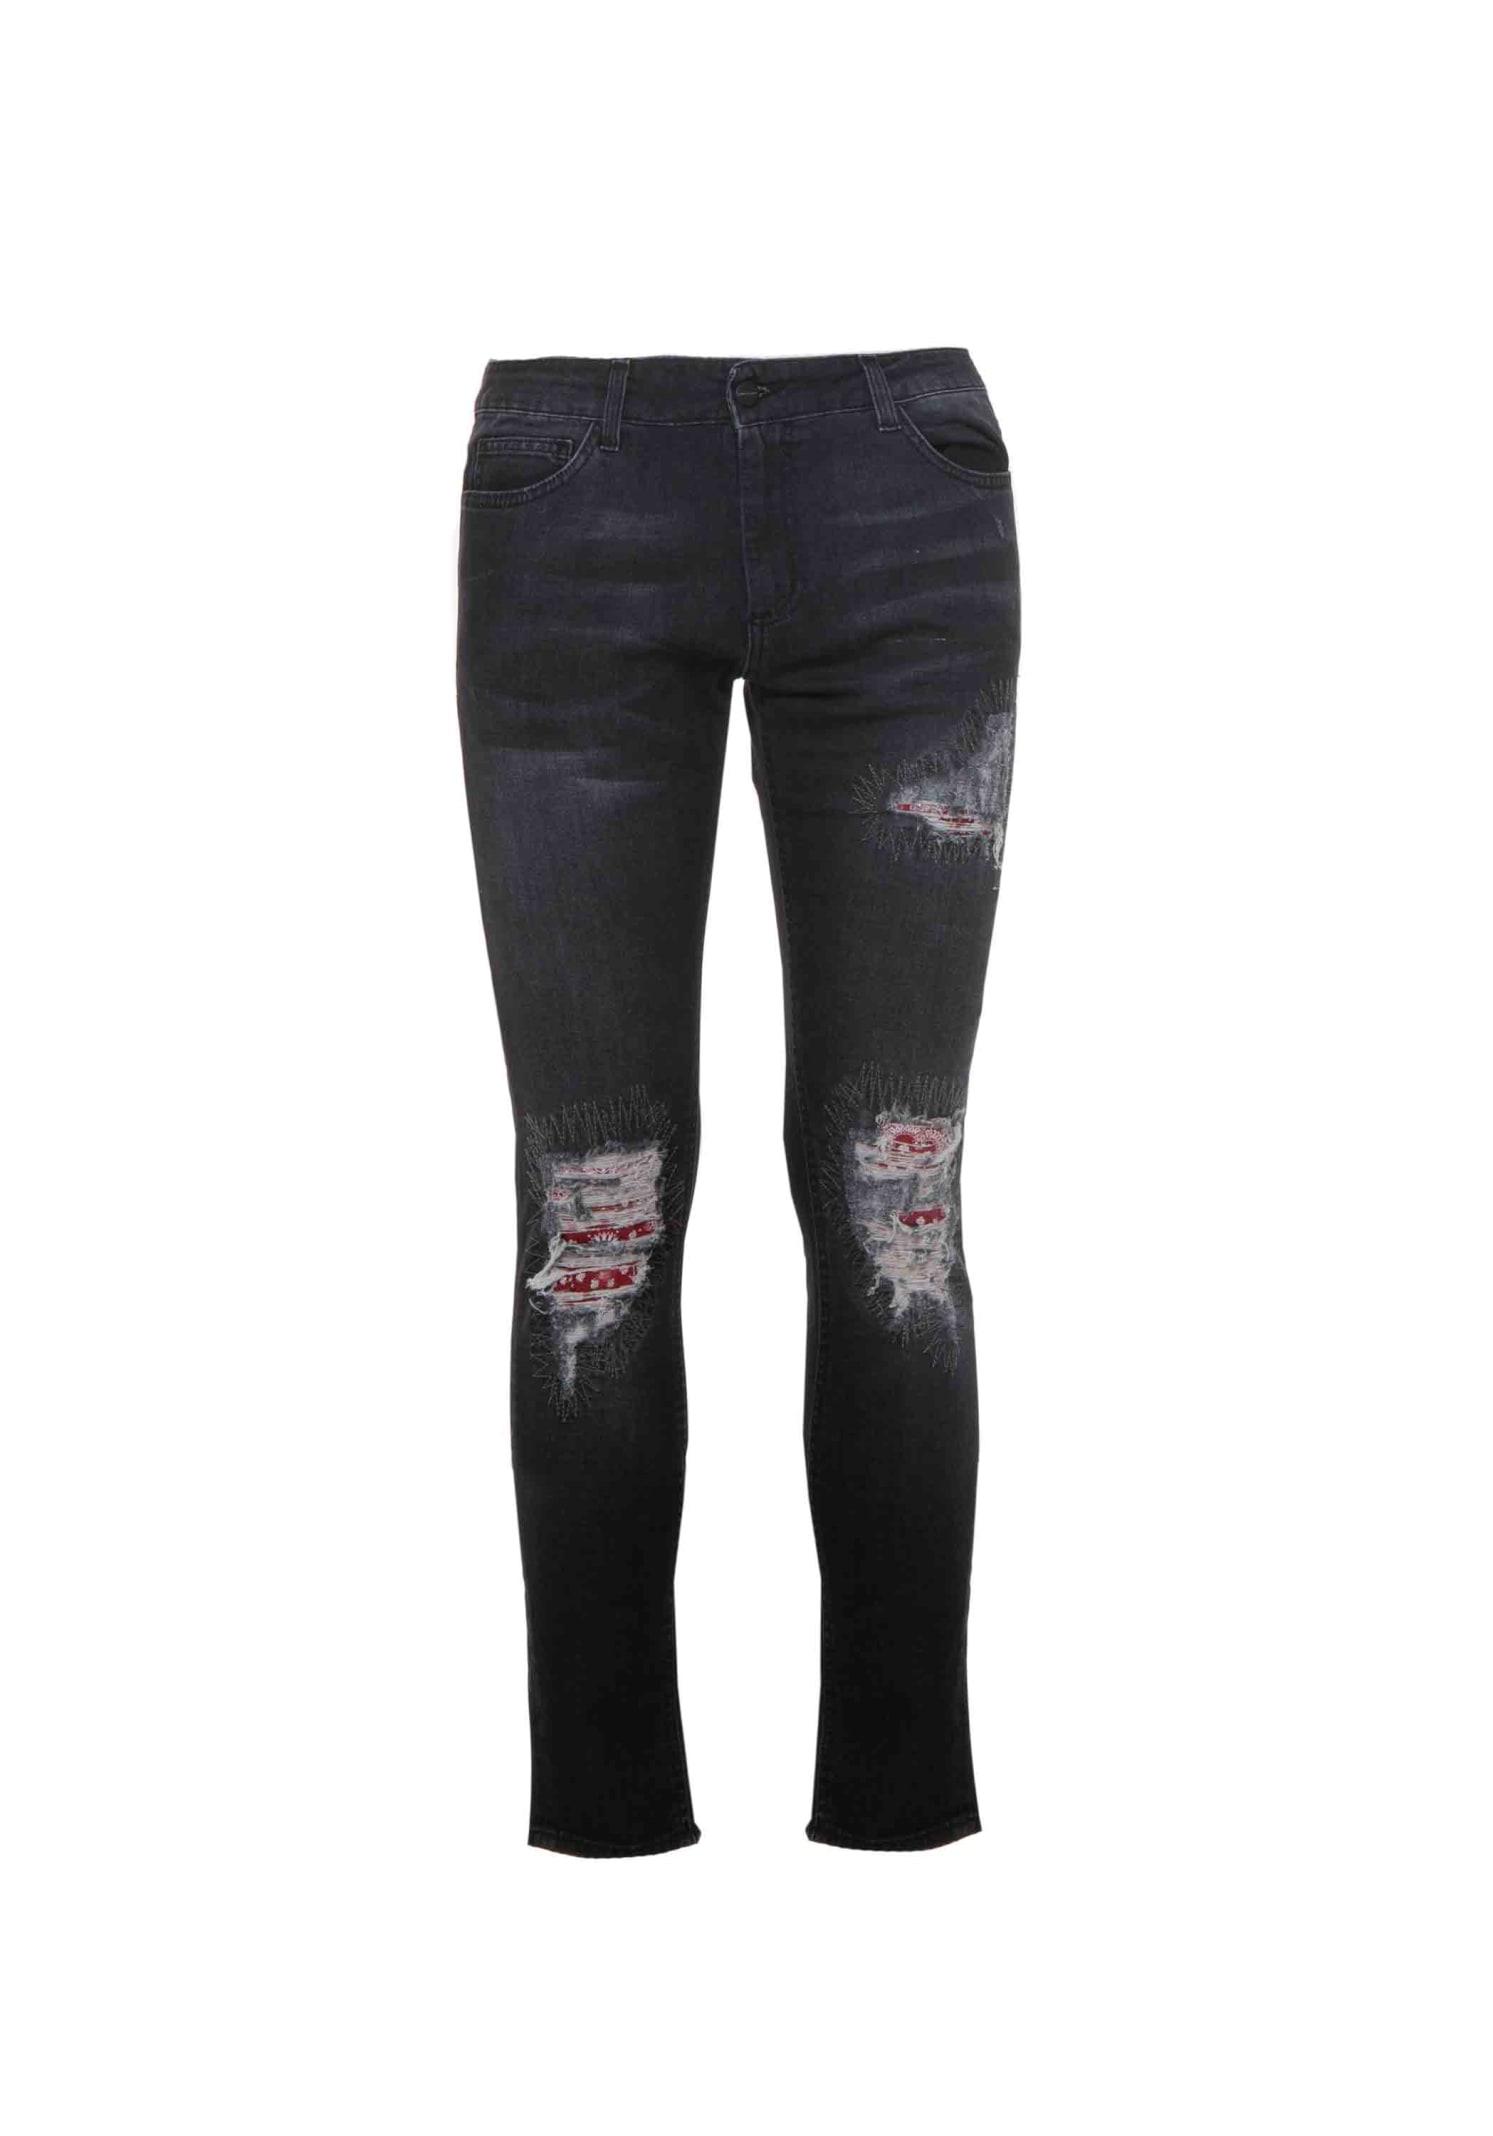 Jeans Denim Patch Bandana Black